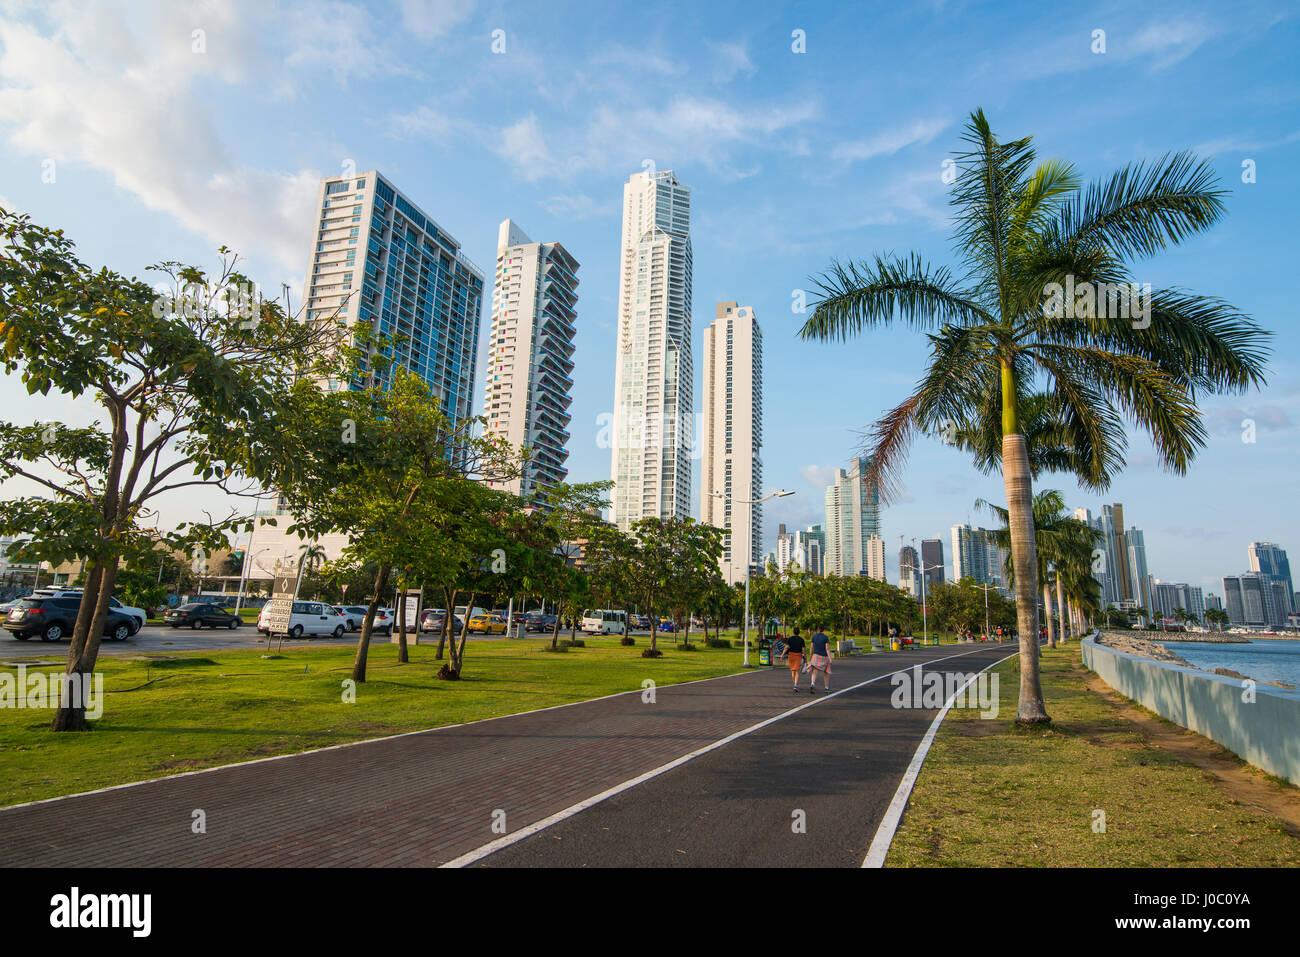 Gehweg und die Skyline von Panama City, Panama, Mittelamerika Stockbild